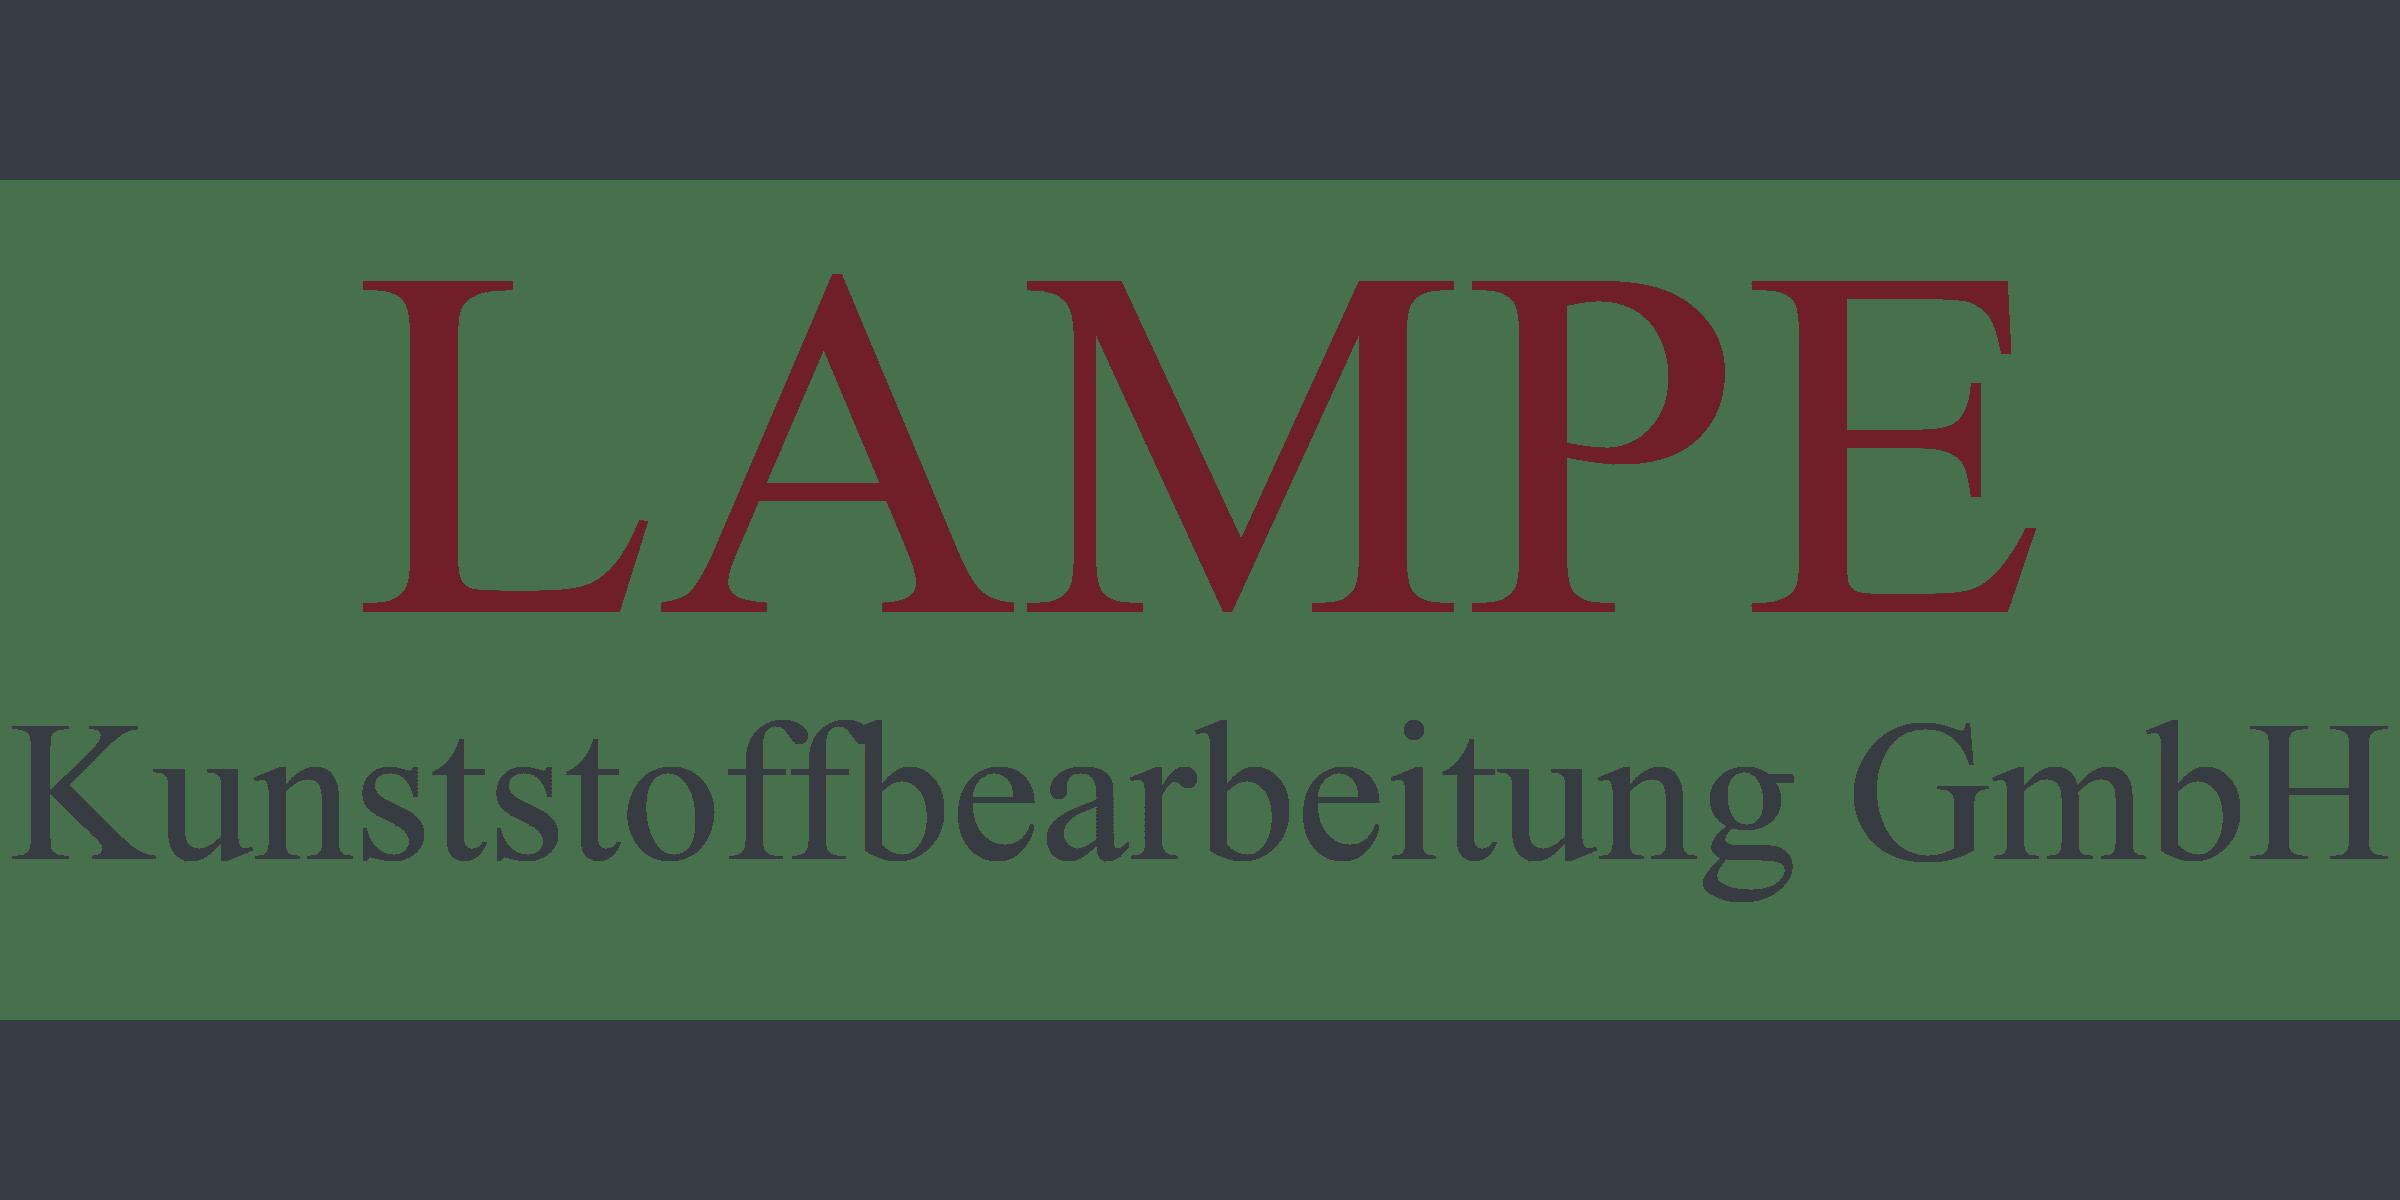 Lampe Kunststoffbearbeitung